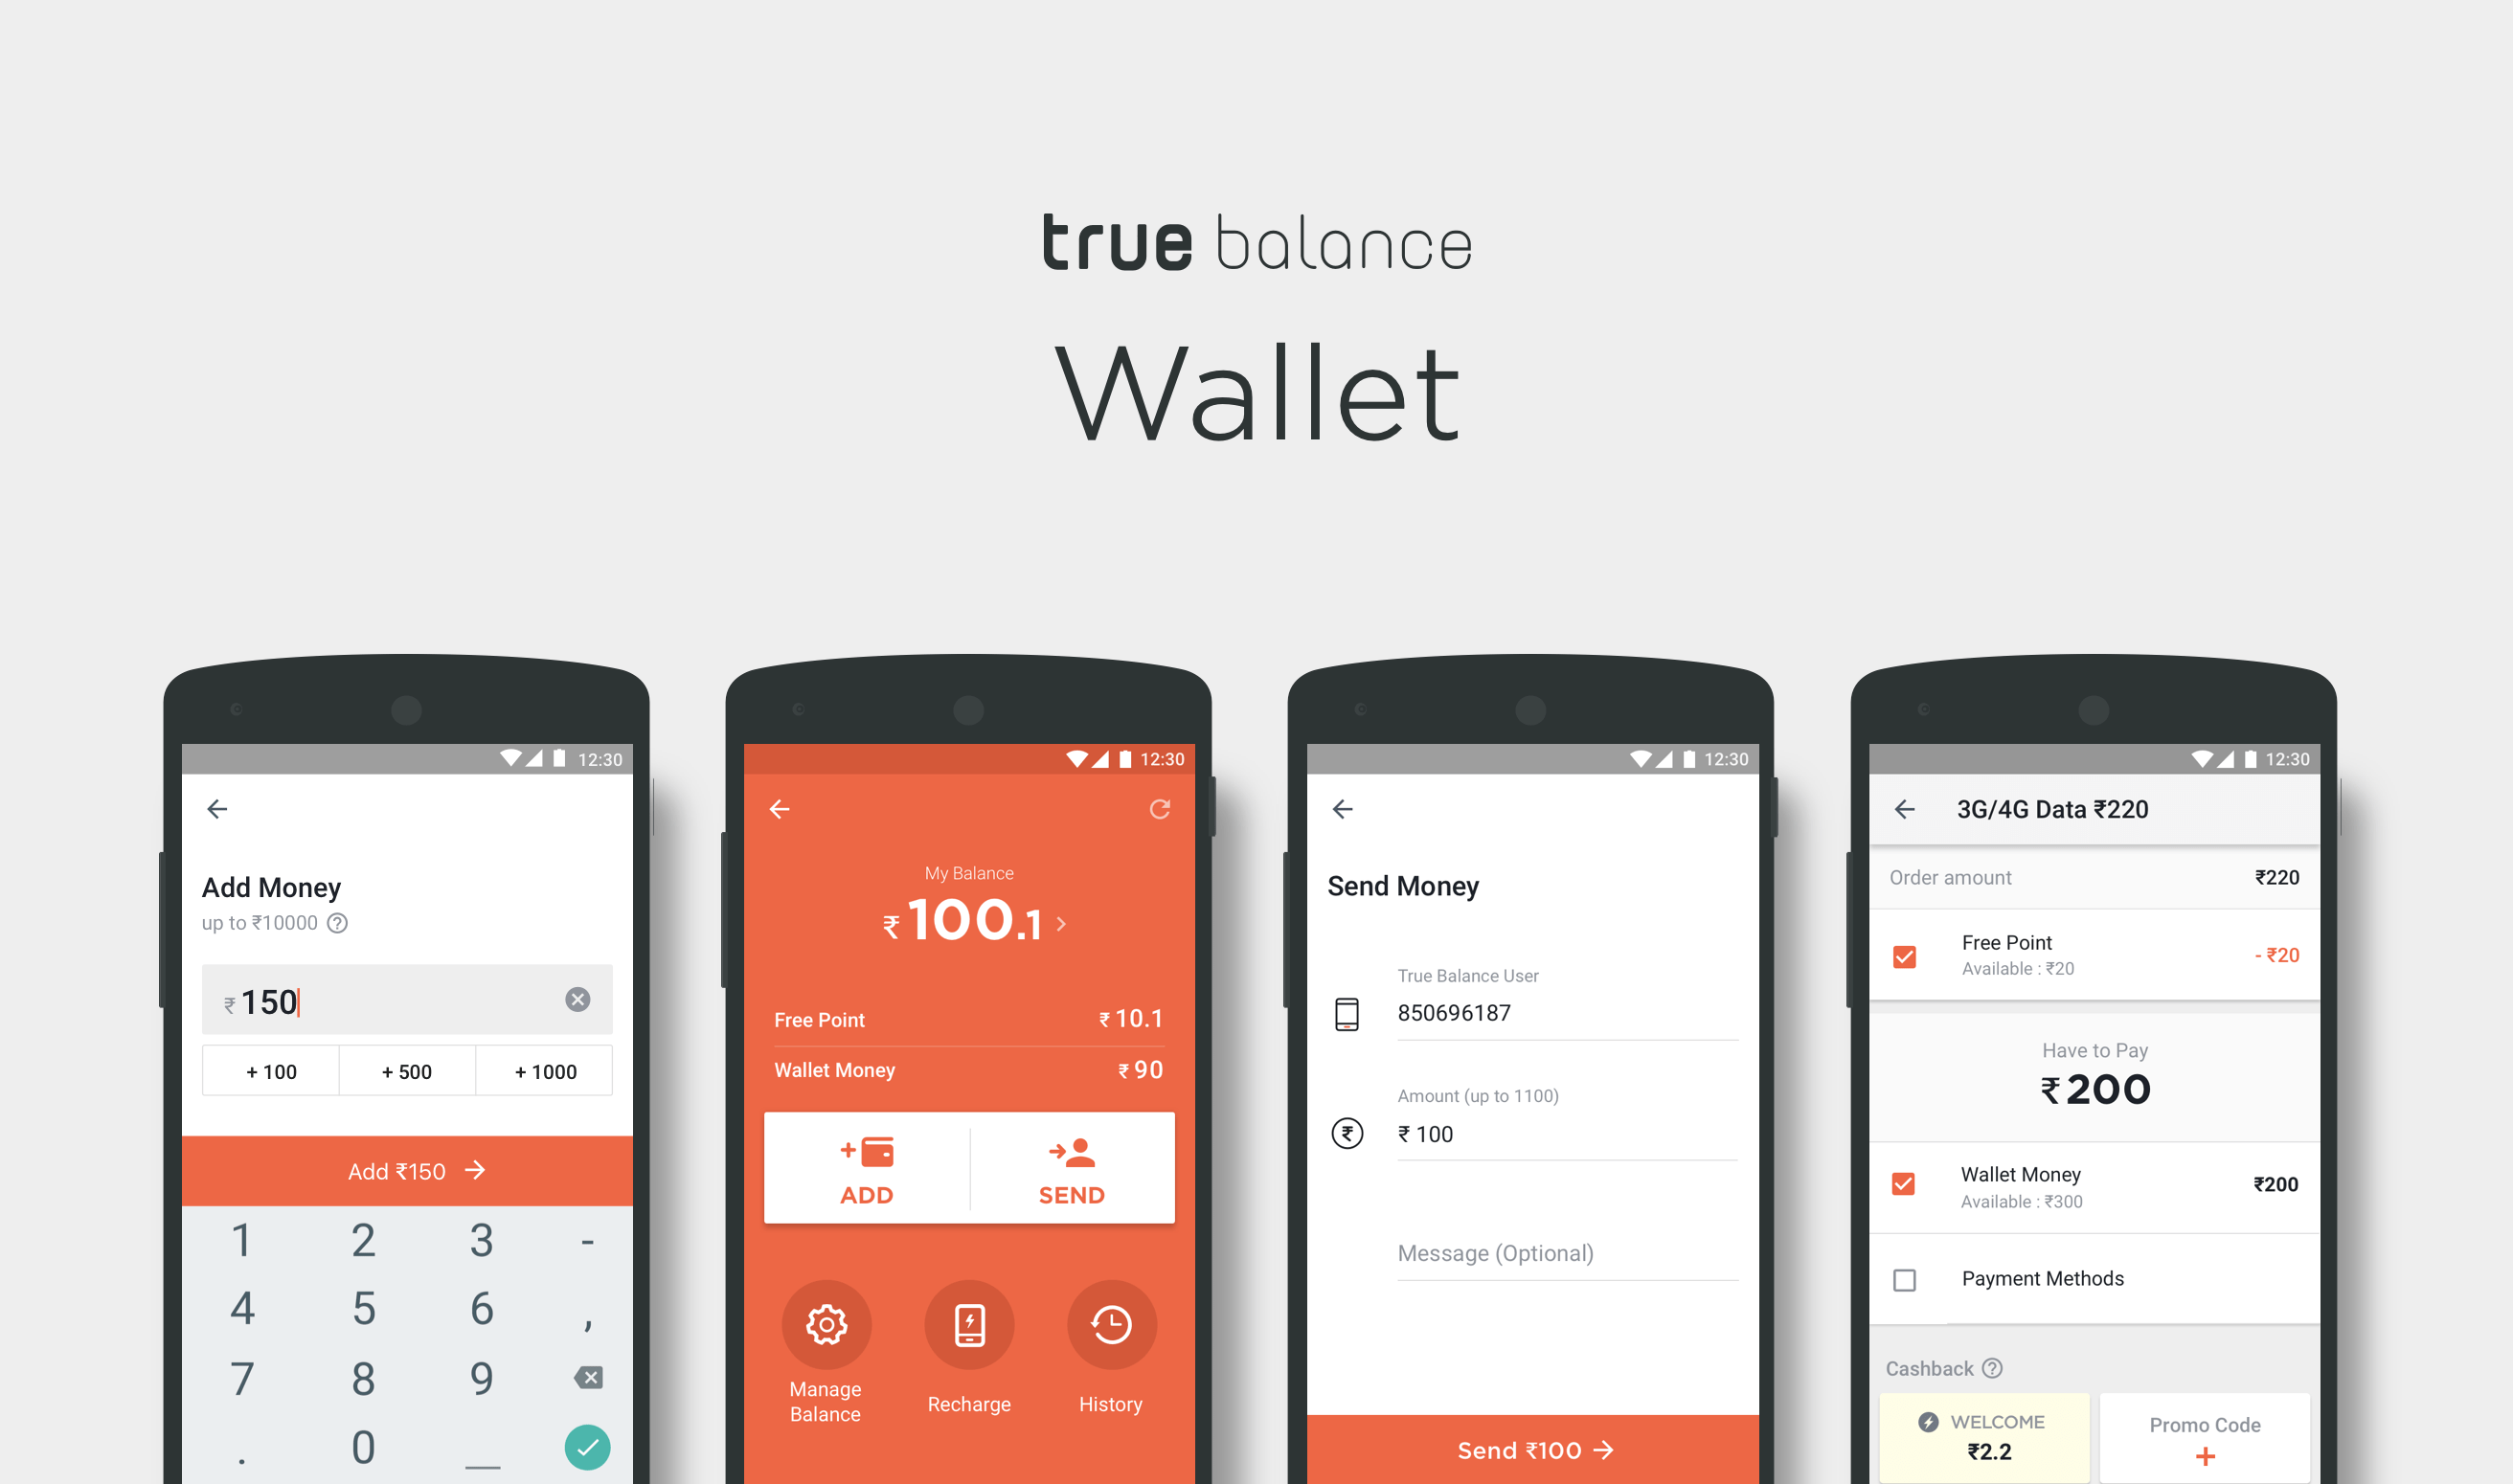 True Balance Wallet